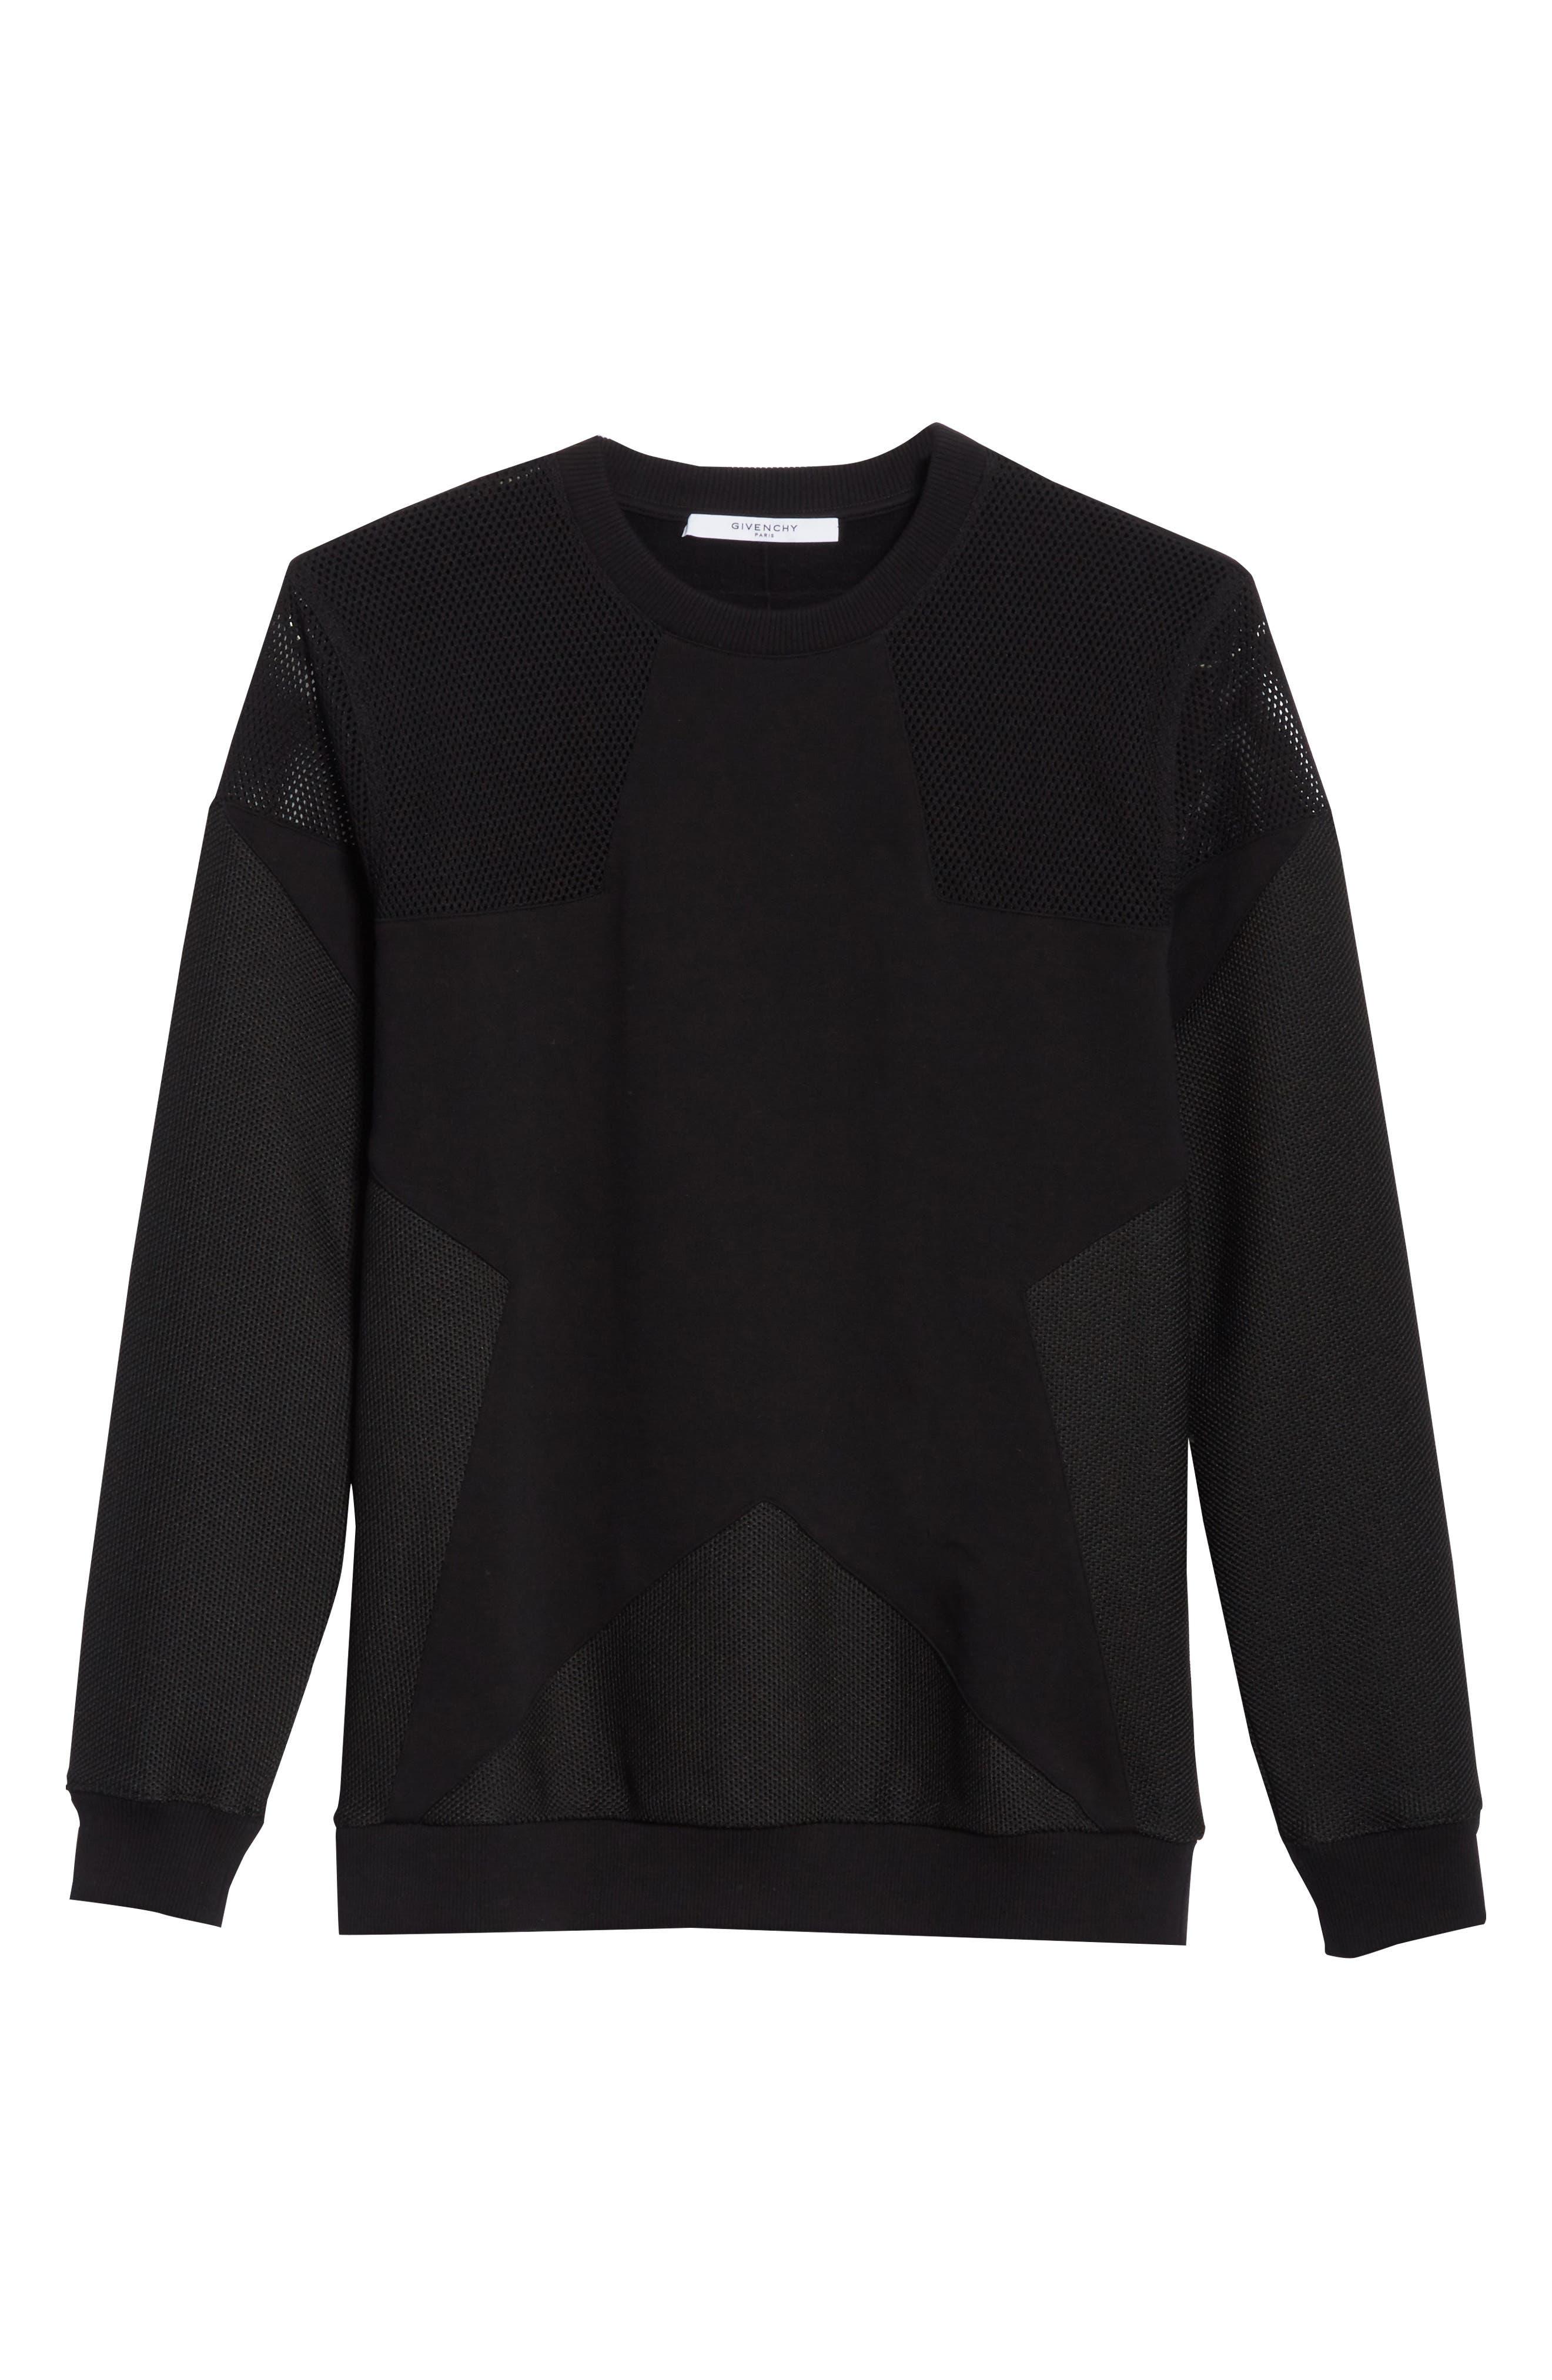 Mesh Star Crewneck Sweatshirt,                             Alternate thumbnail 6, color,                             Black